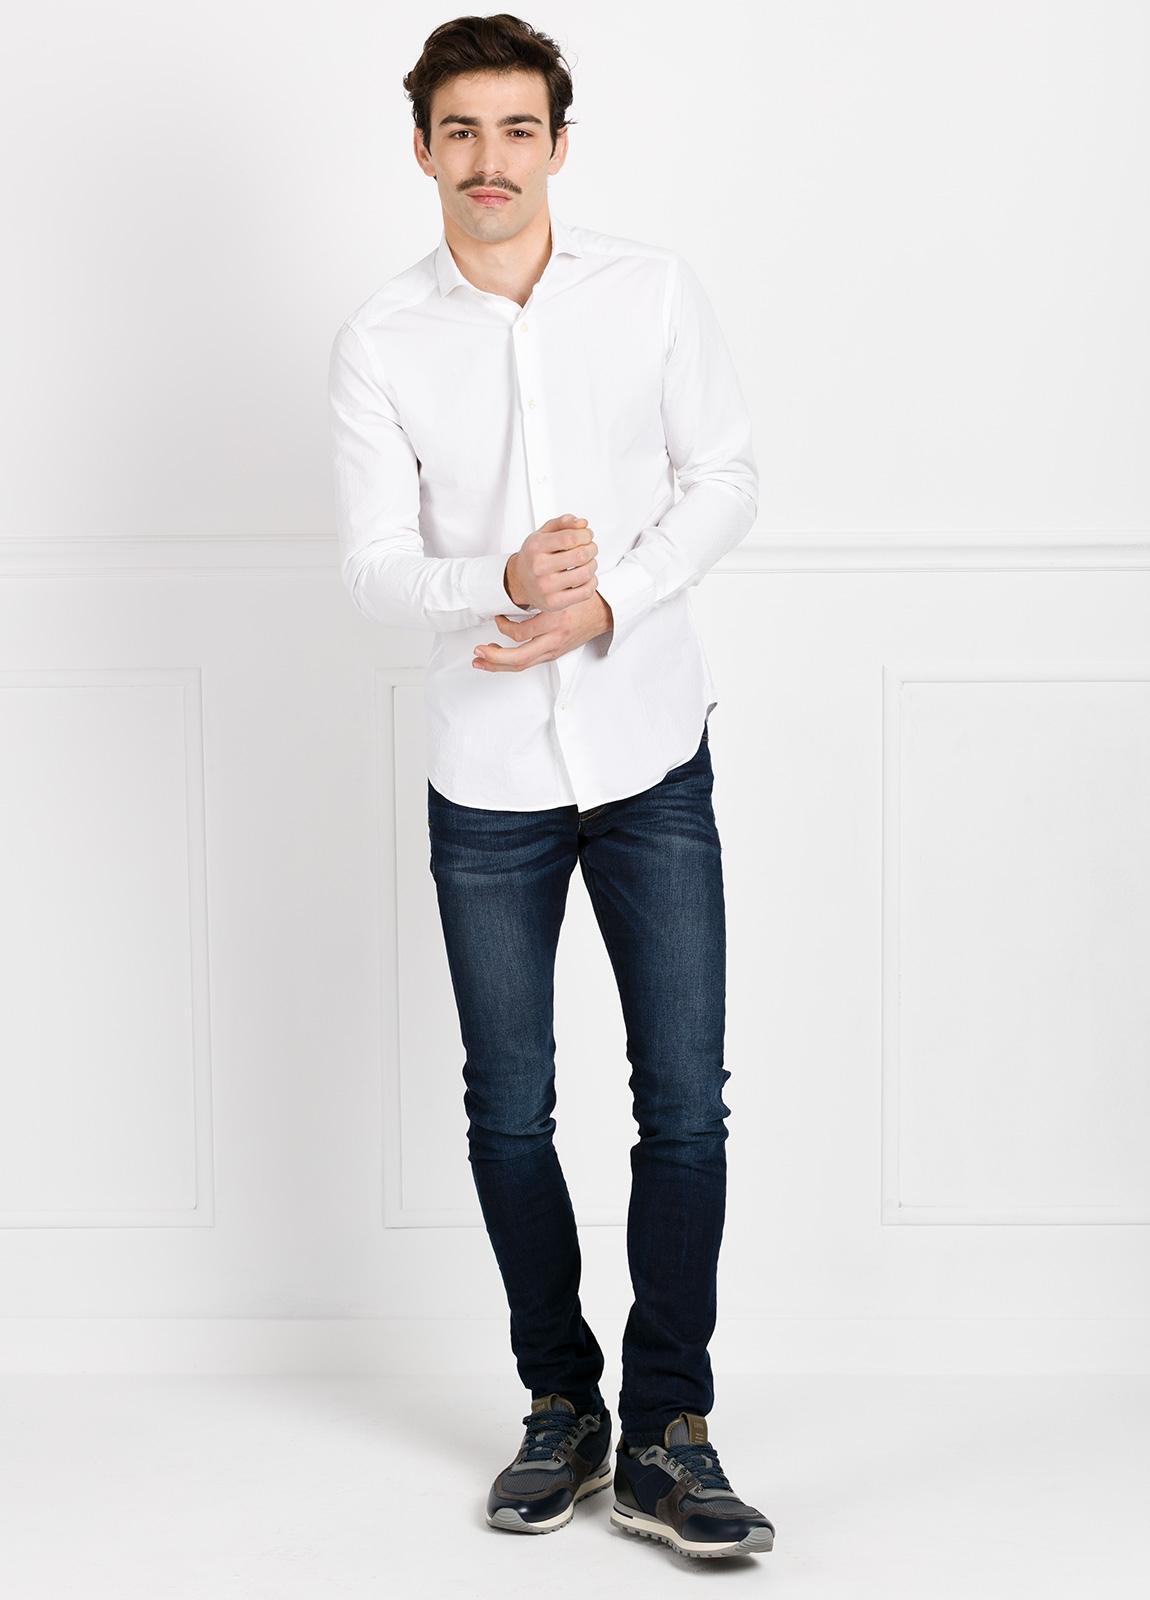 Camisa Leisure Wear SLIM FIT Modelo CAPRI color blanco micrograbado. 100% Algodón.